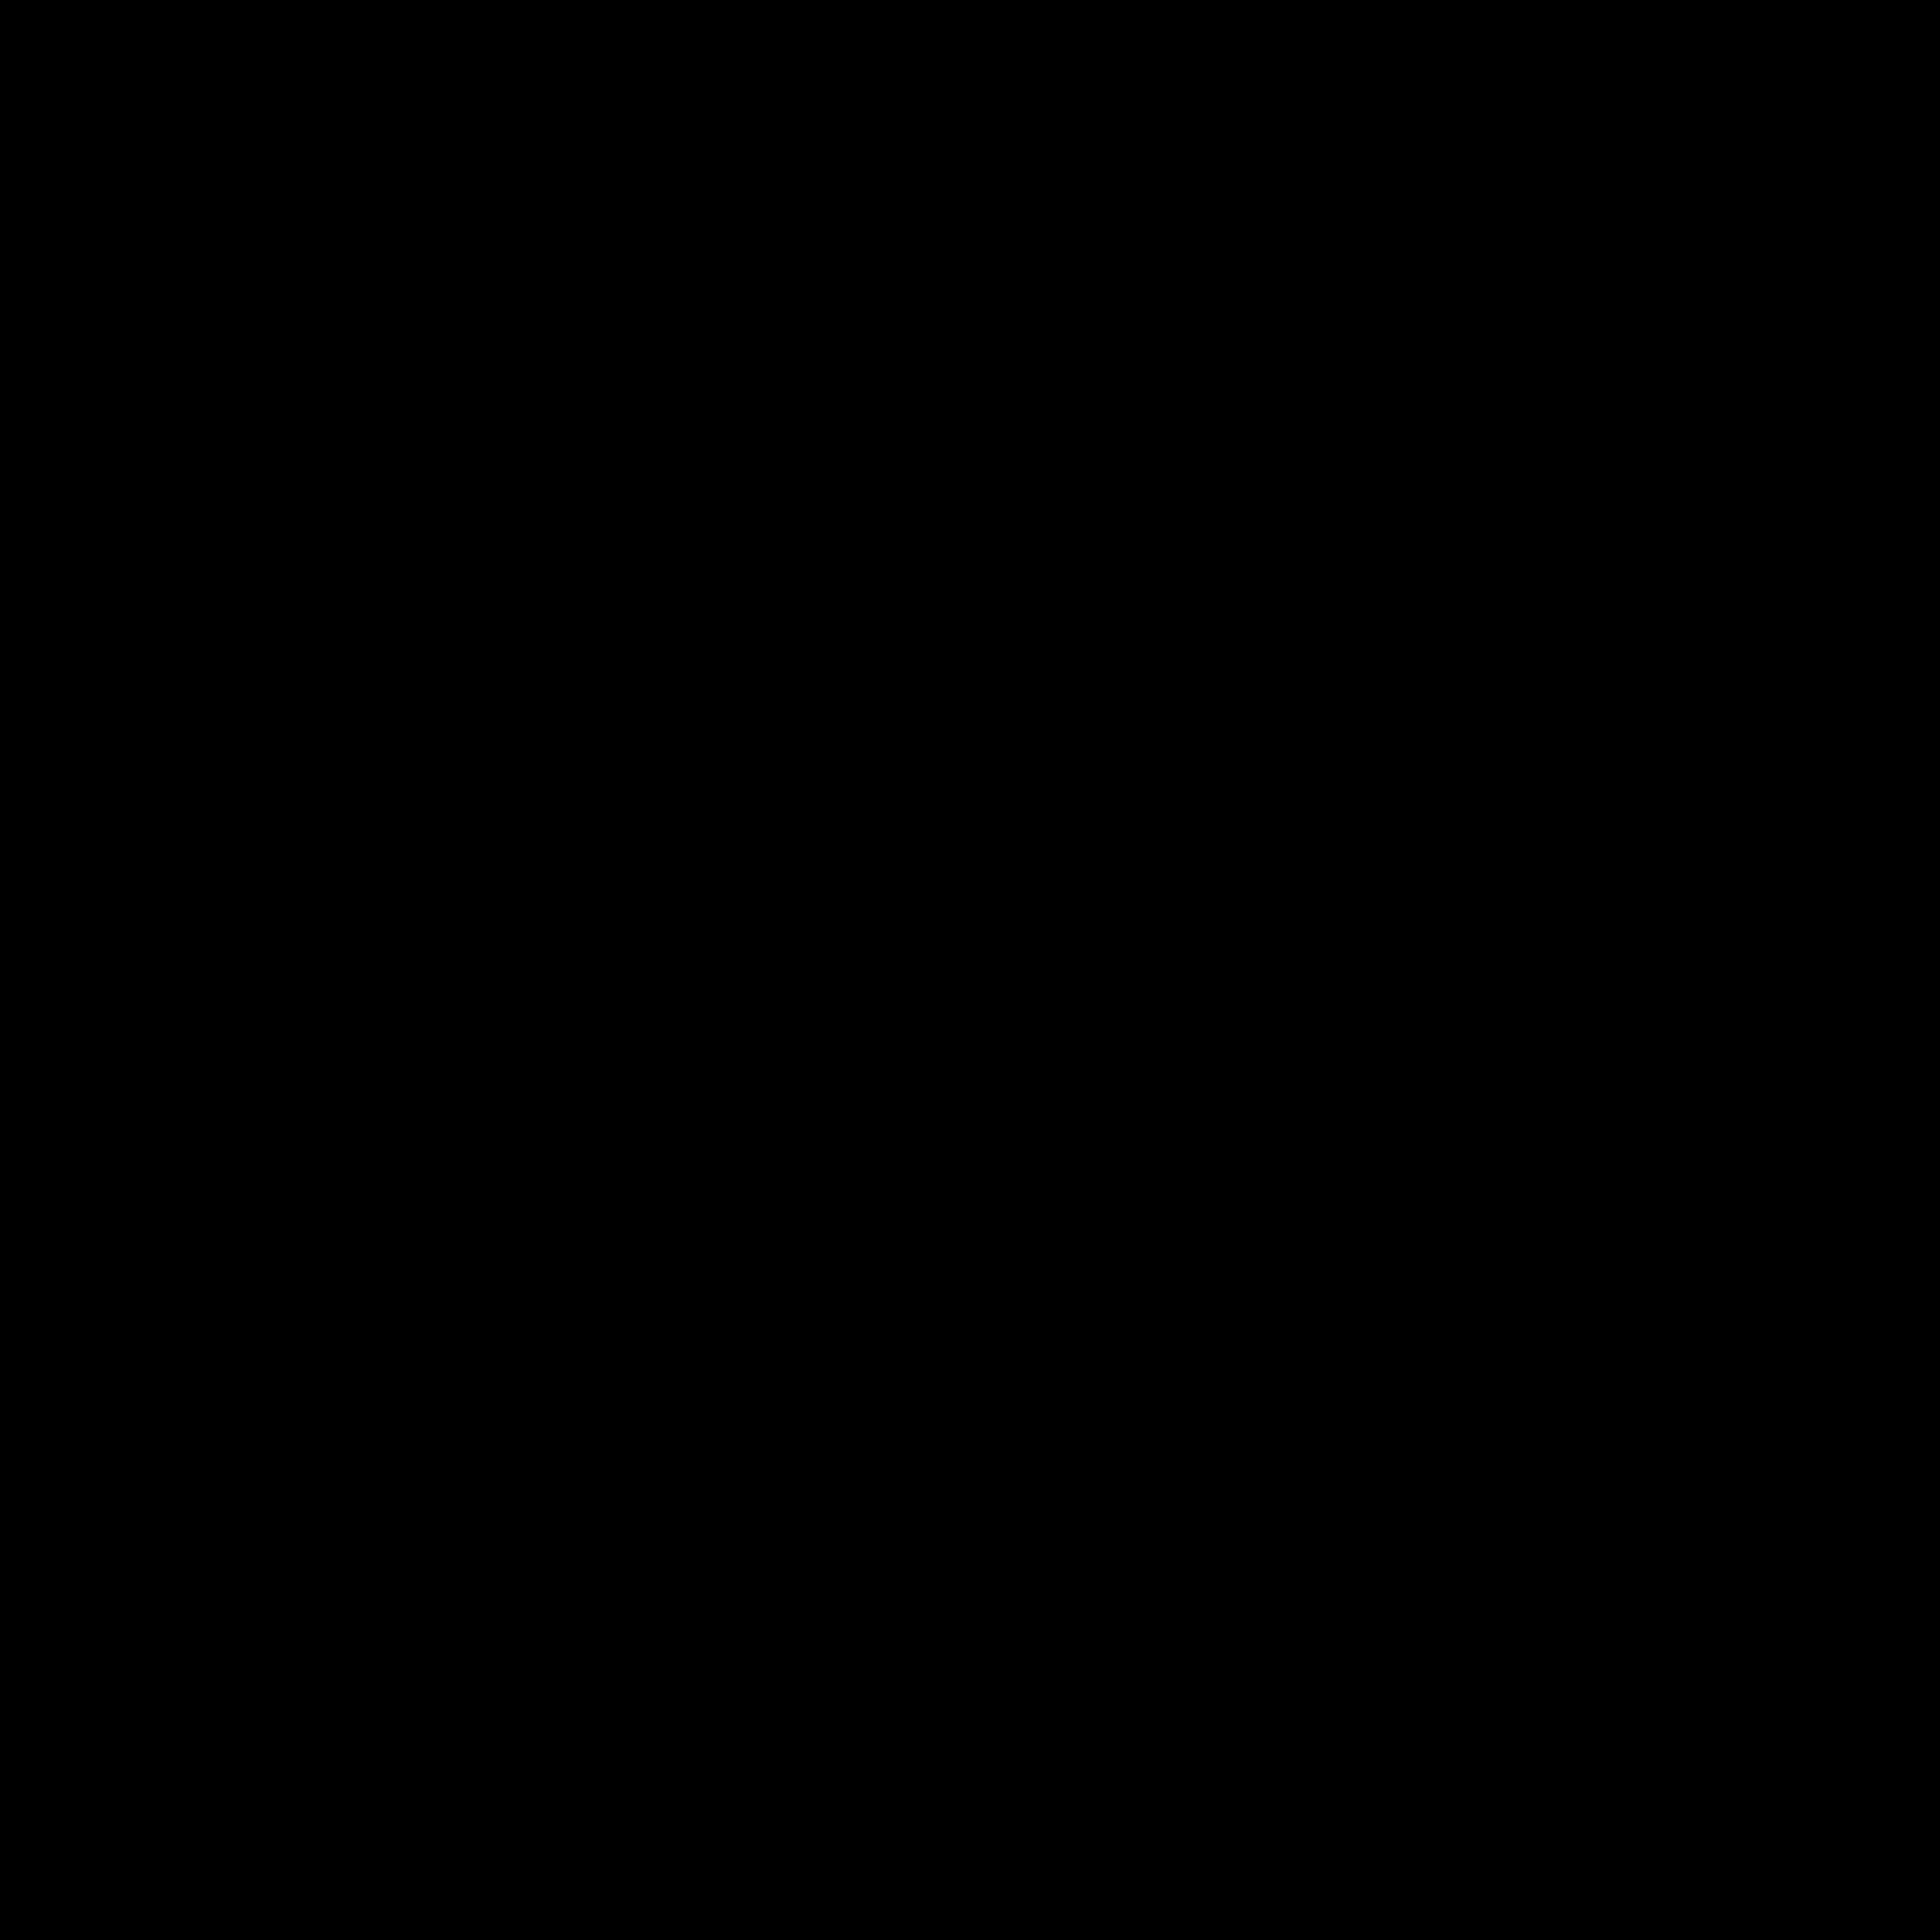 Images of black sun. Clipart sunshine symbol